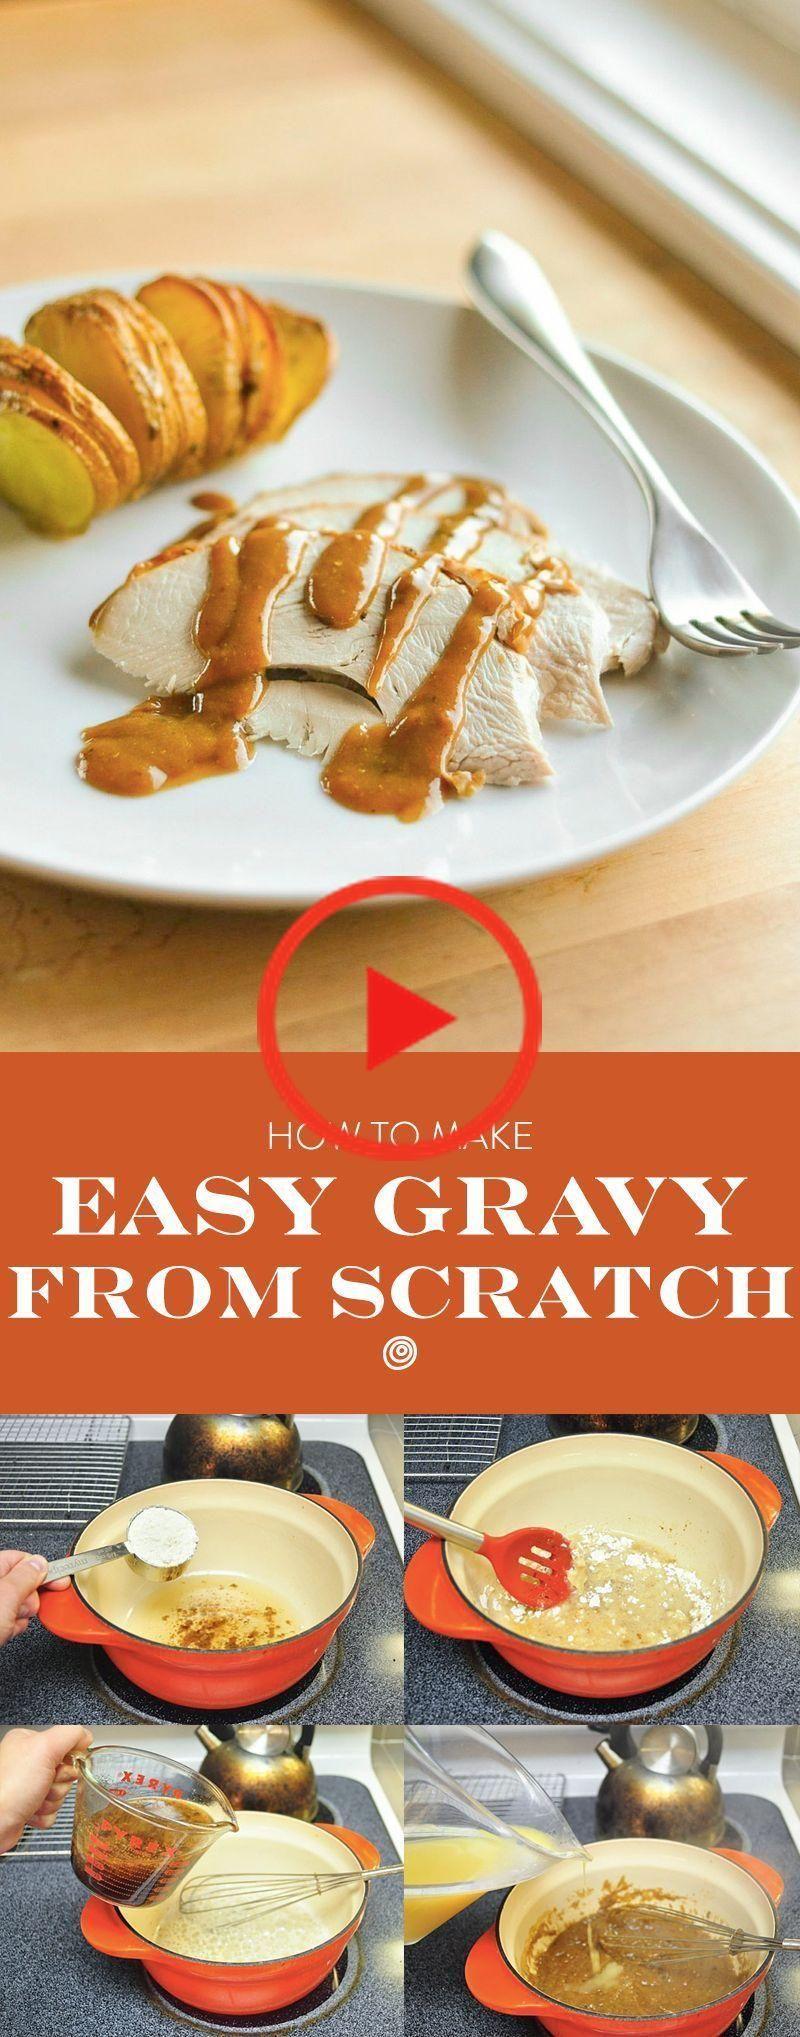 How To Make Turkey Gravy #turkeygravyfromdrippingseasy How To Make Brown or White Gravy From #turkeygravyfromdrippingseasy